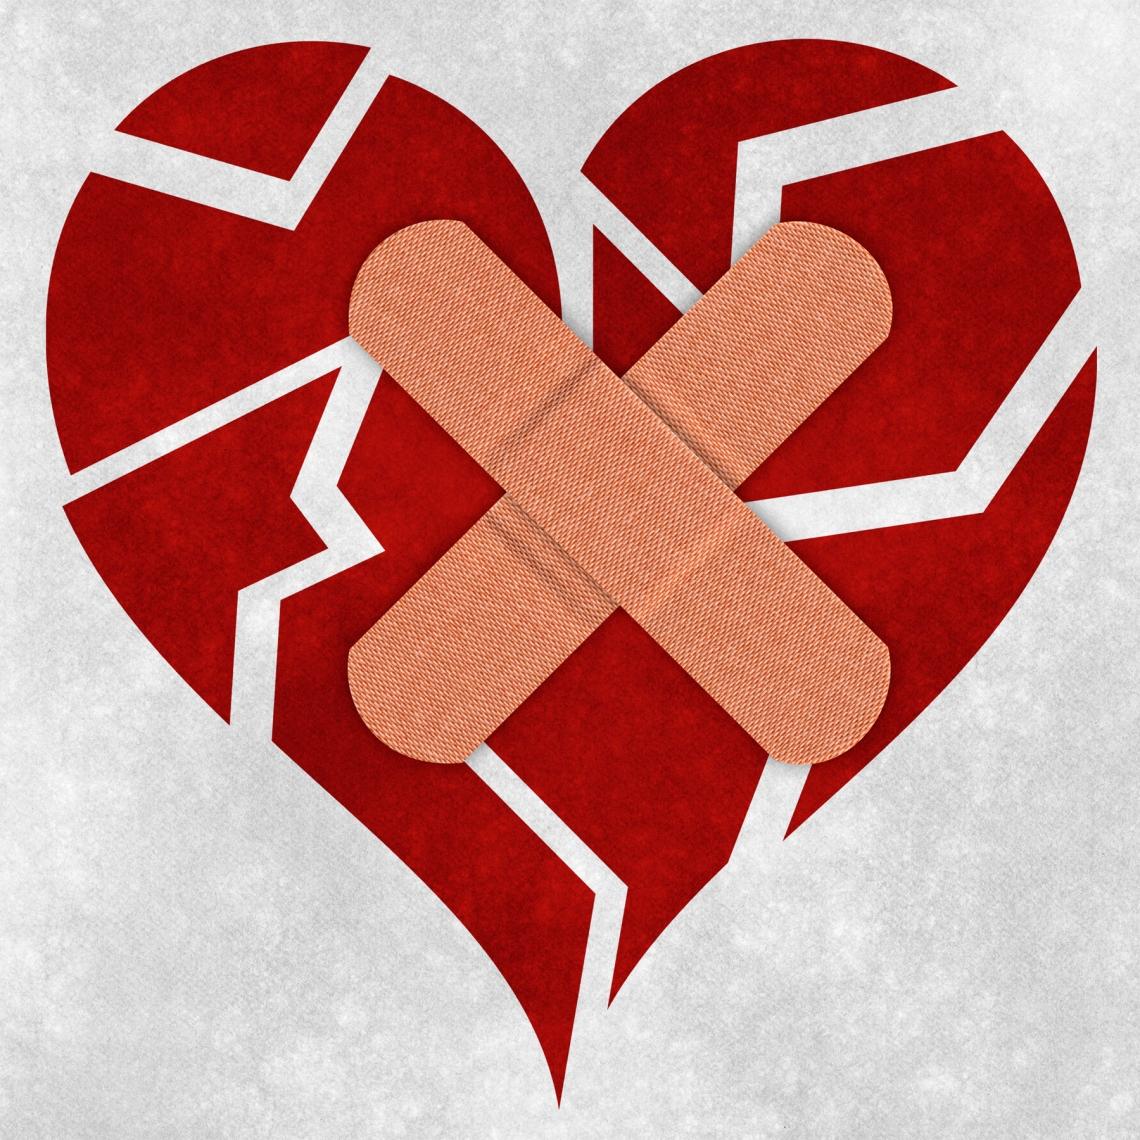 5 types de pervers narcissiques : l'inaccessible, kaléidoscope de moi, Bamba aida marguerite, relation amoureuse, pervers narcissique